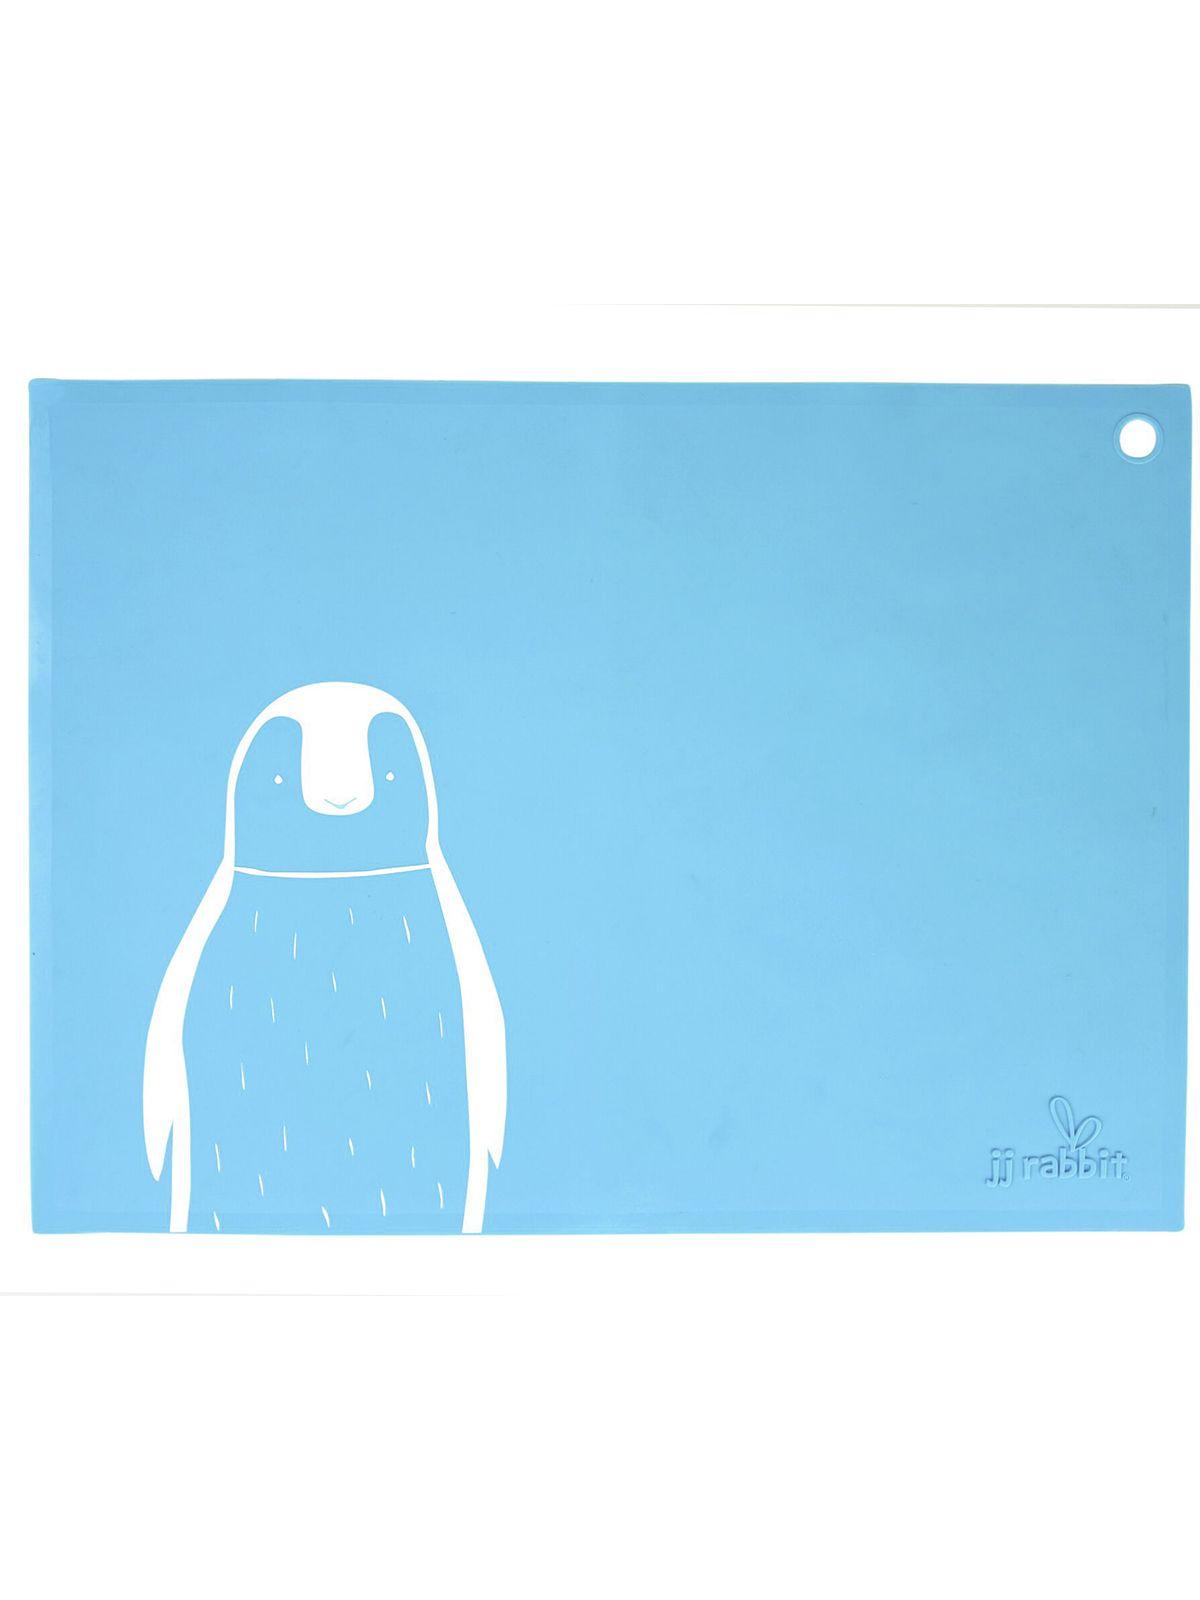 Пинкл (Pinkl) | Коврик для кормления siliMAT пингвин | Jjrabbit Silimat Penguin